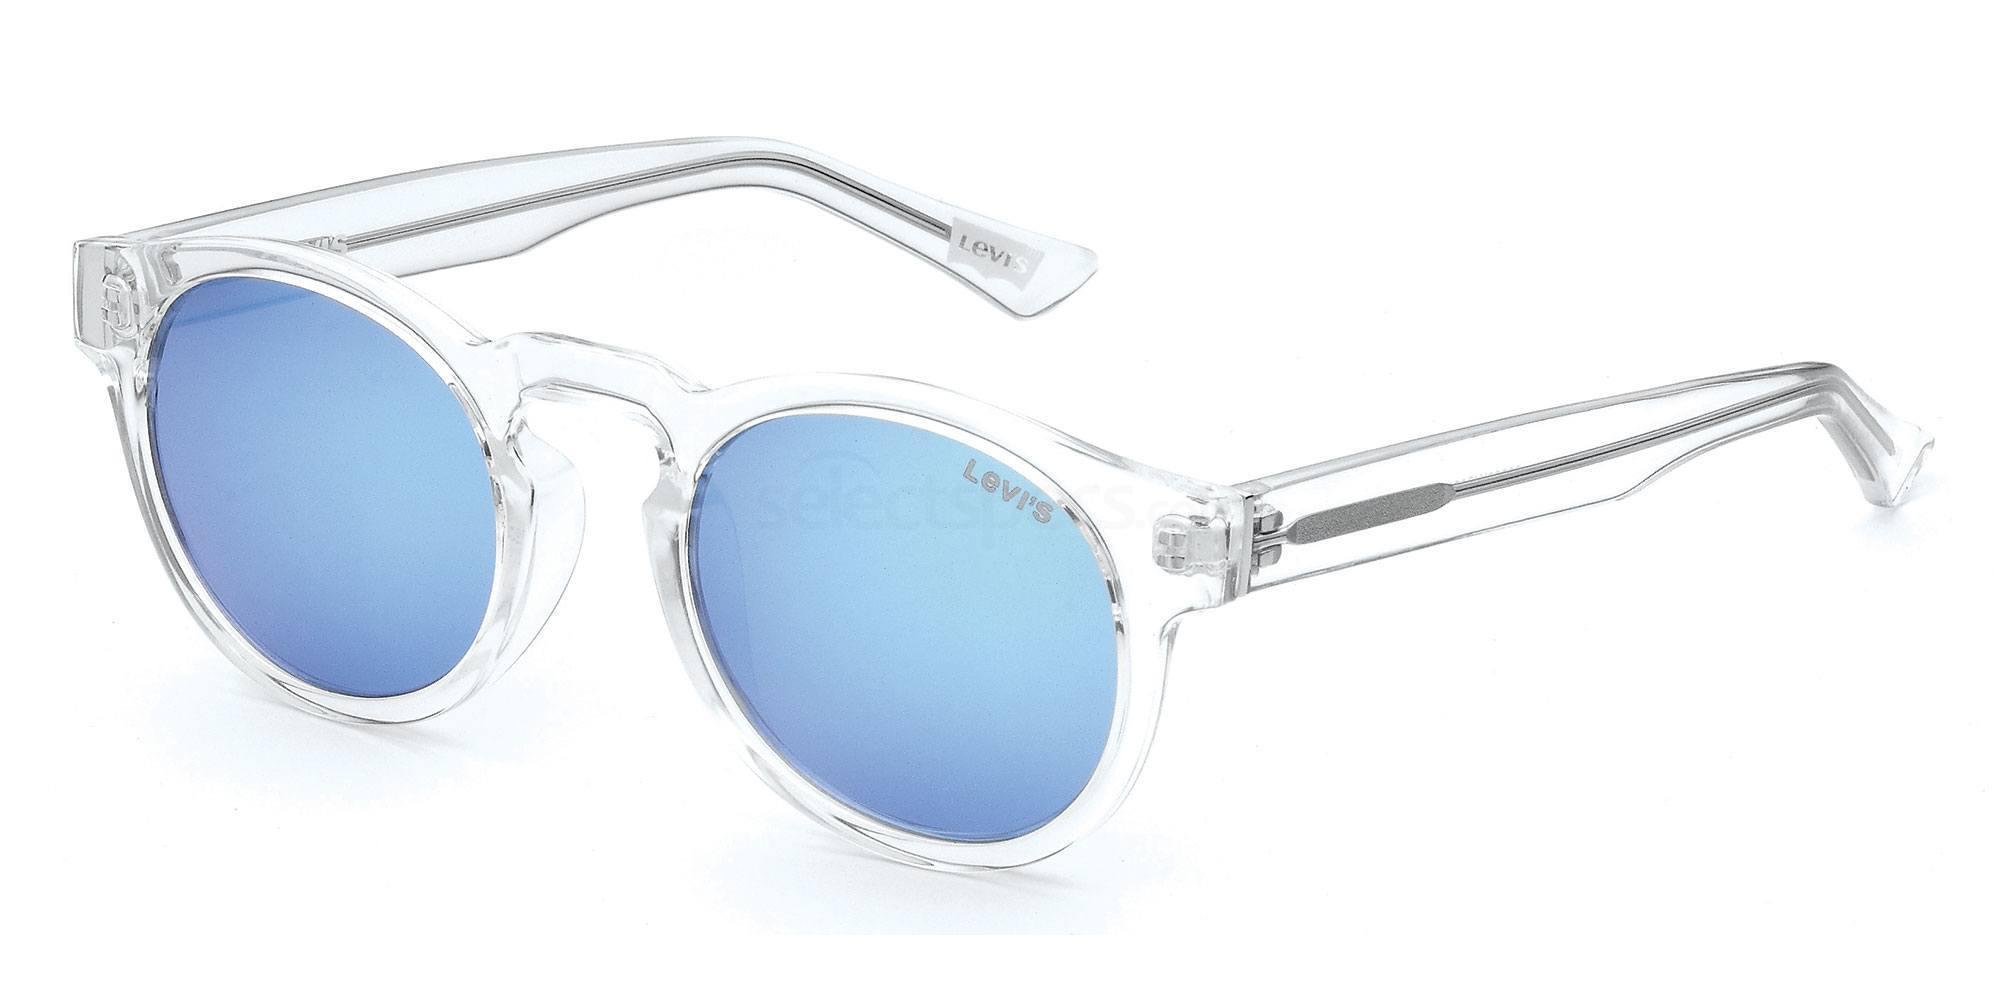 LO22380/01 LO22380 Sunglasses, Levi's Eyewear